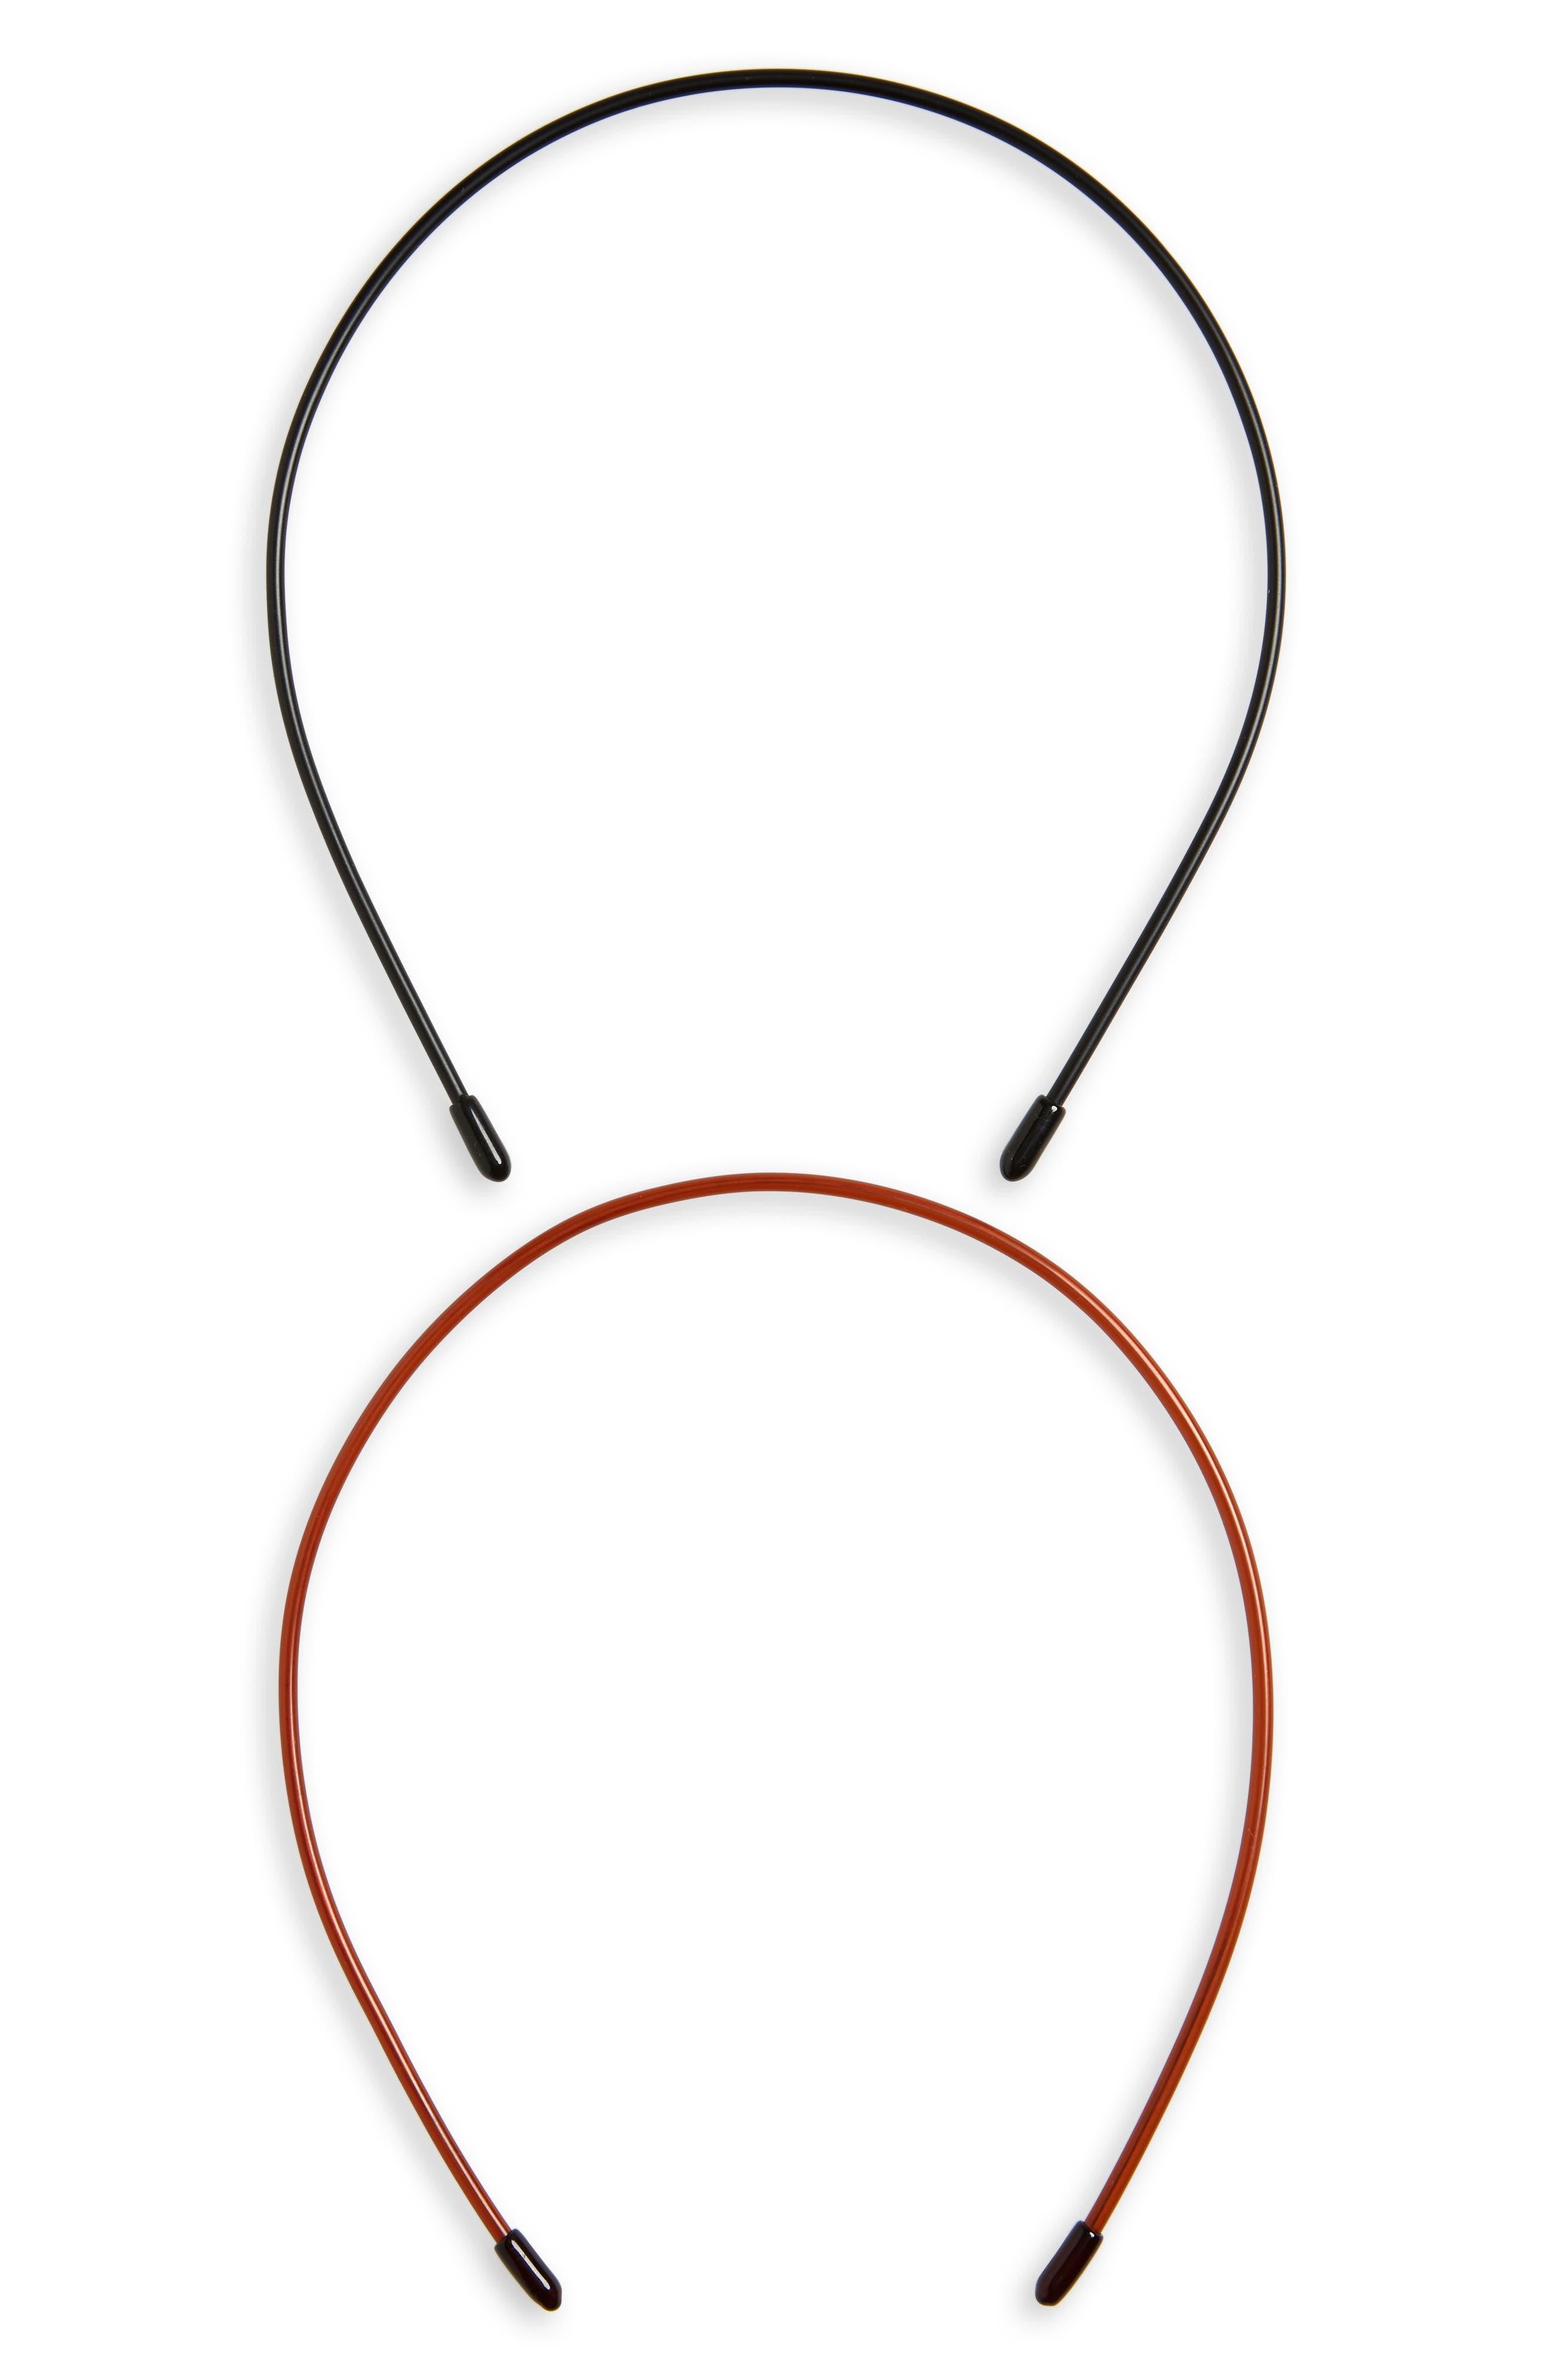 Twiggy 2-Pack Headbands,                             Main thumbnail 1, color,                             BLACK/ TORTOISE